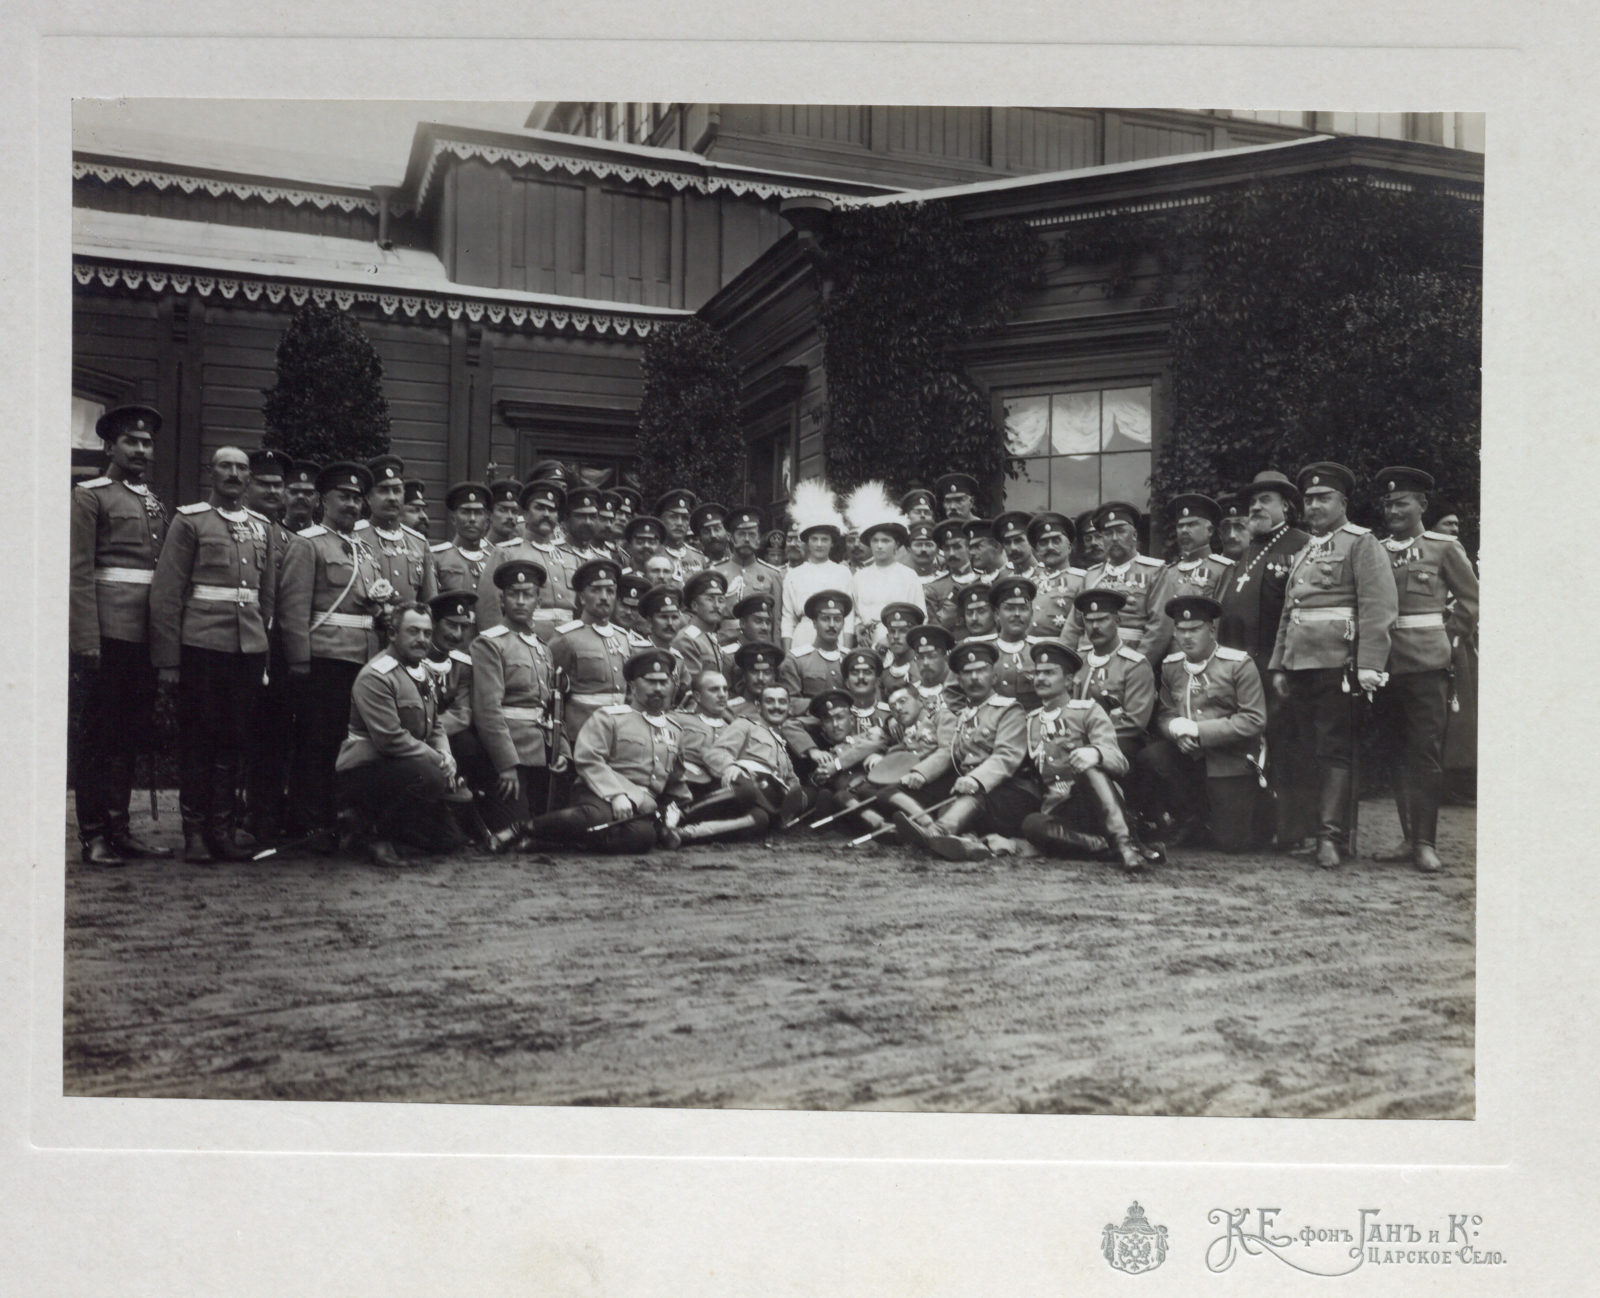 Emperor Nicholas II, Grand duchesses Tatiana, Olga, with army officers